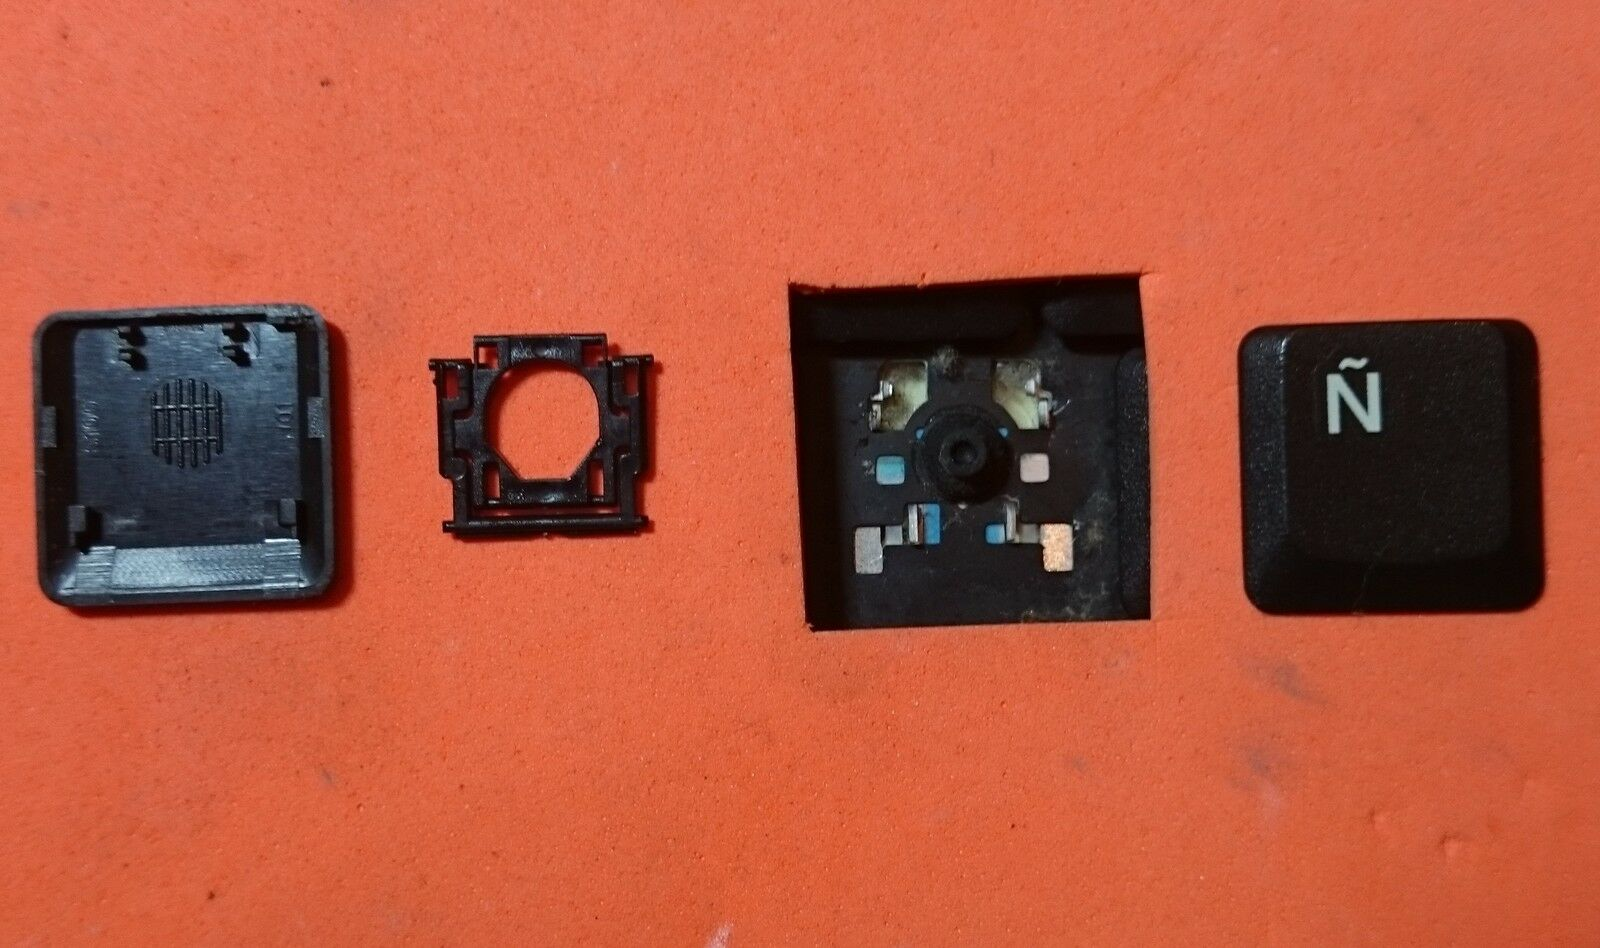 TECLA TECLAS DE TECLADO PACKARD BELL EASYNOTE ALP AJAX A D C2 C3 GDC MX61 MX65